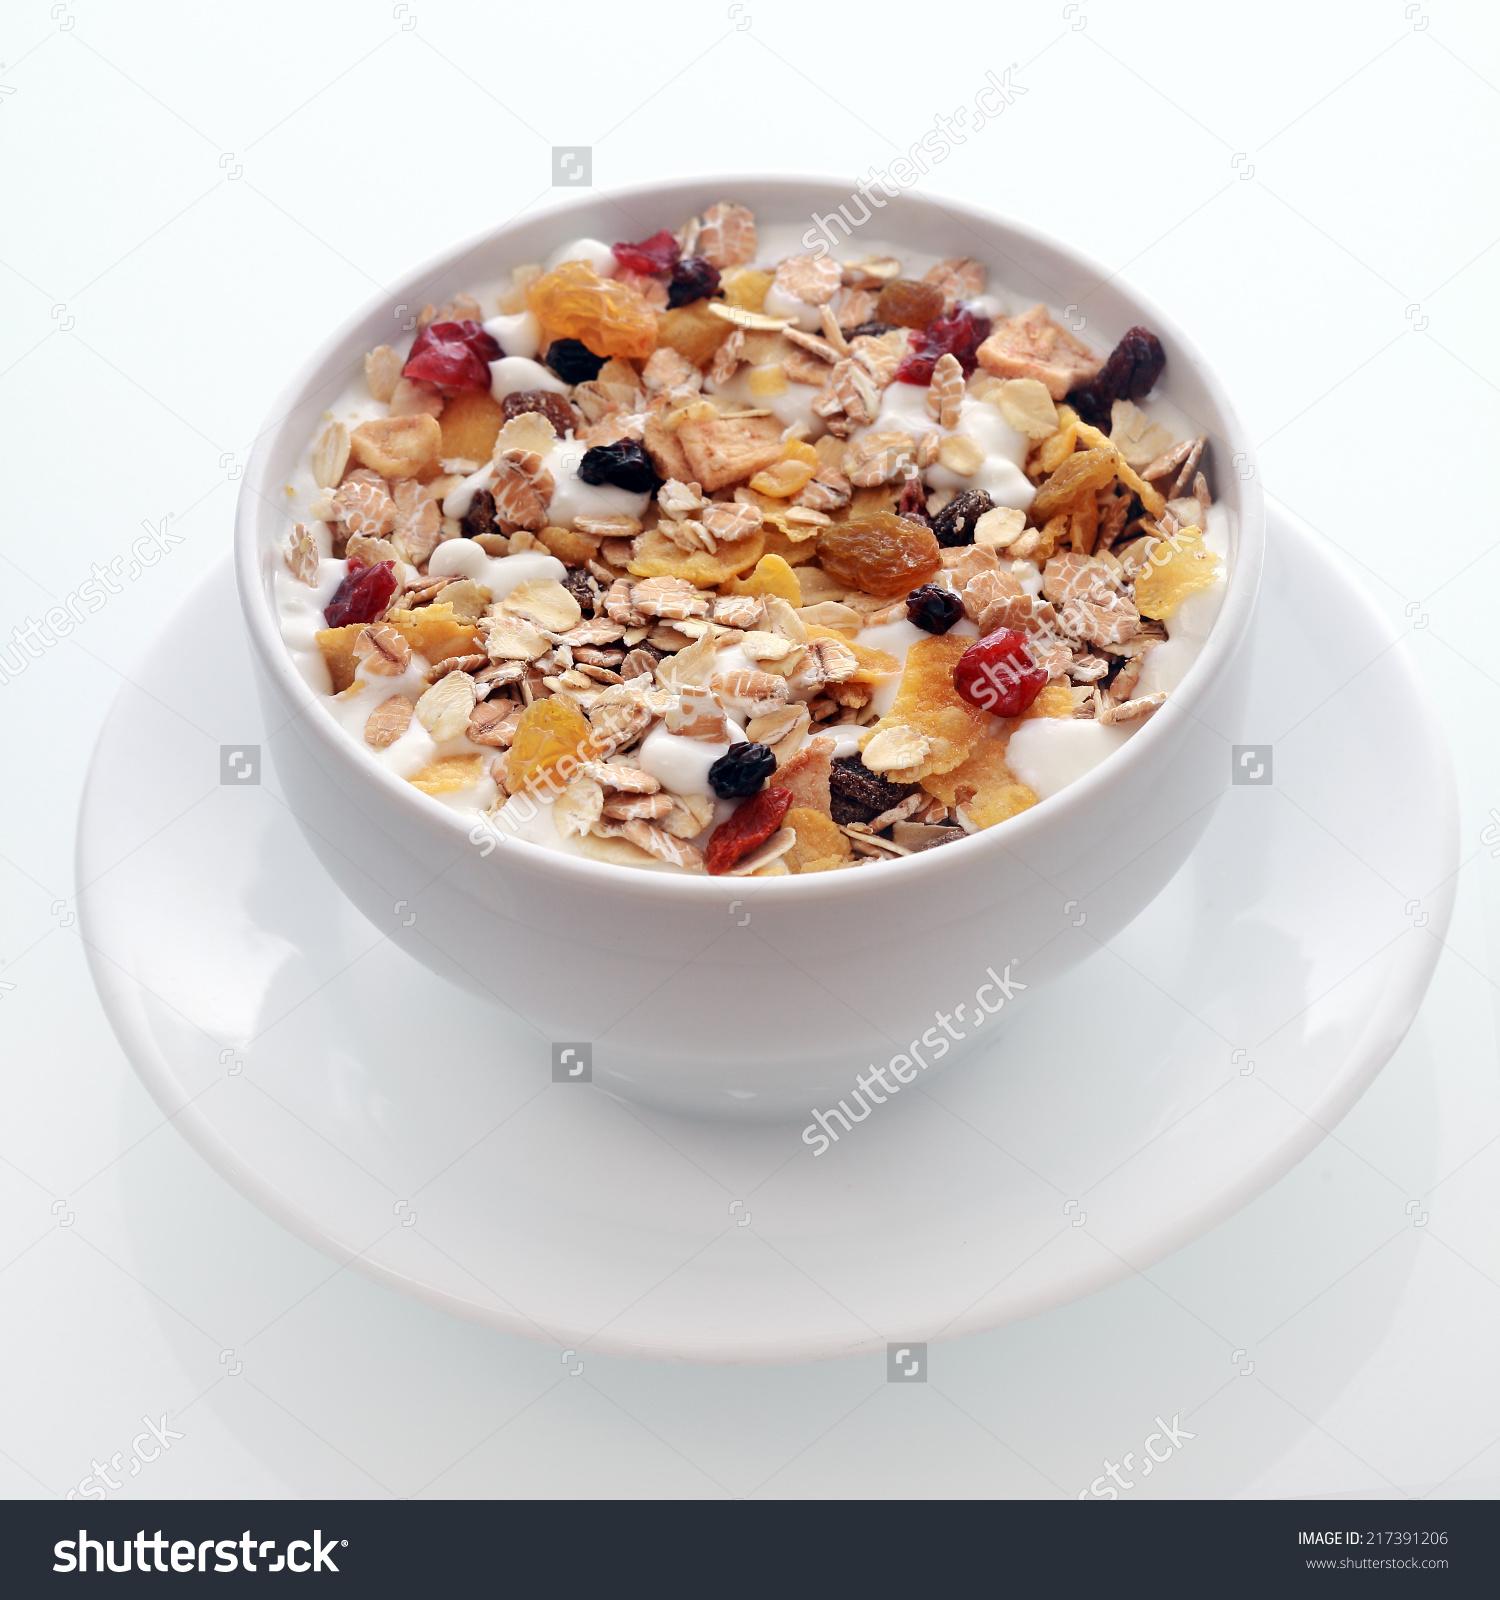 Bowl Delicious Breakfast Muesli Oat Wheat Stock Photo 217391206.